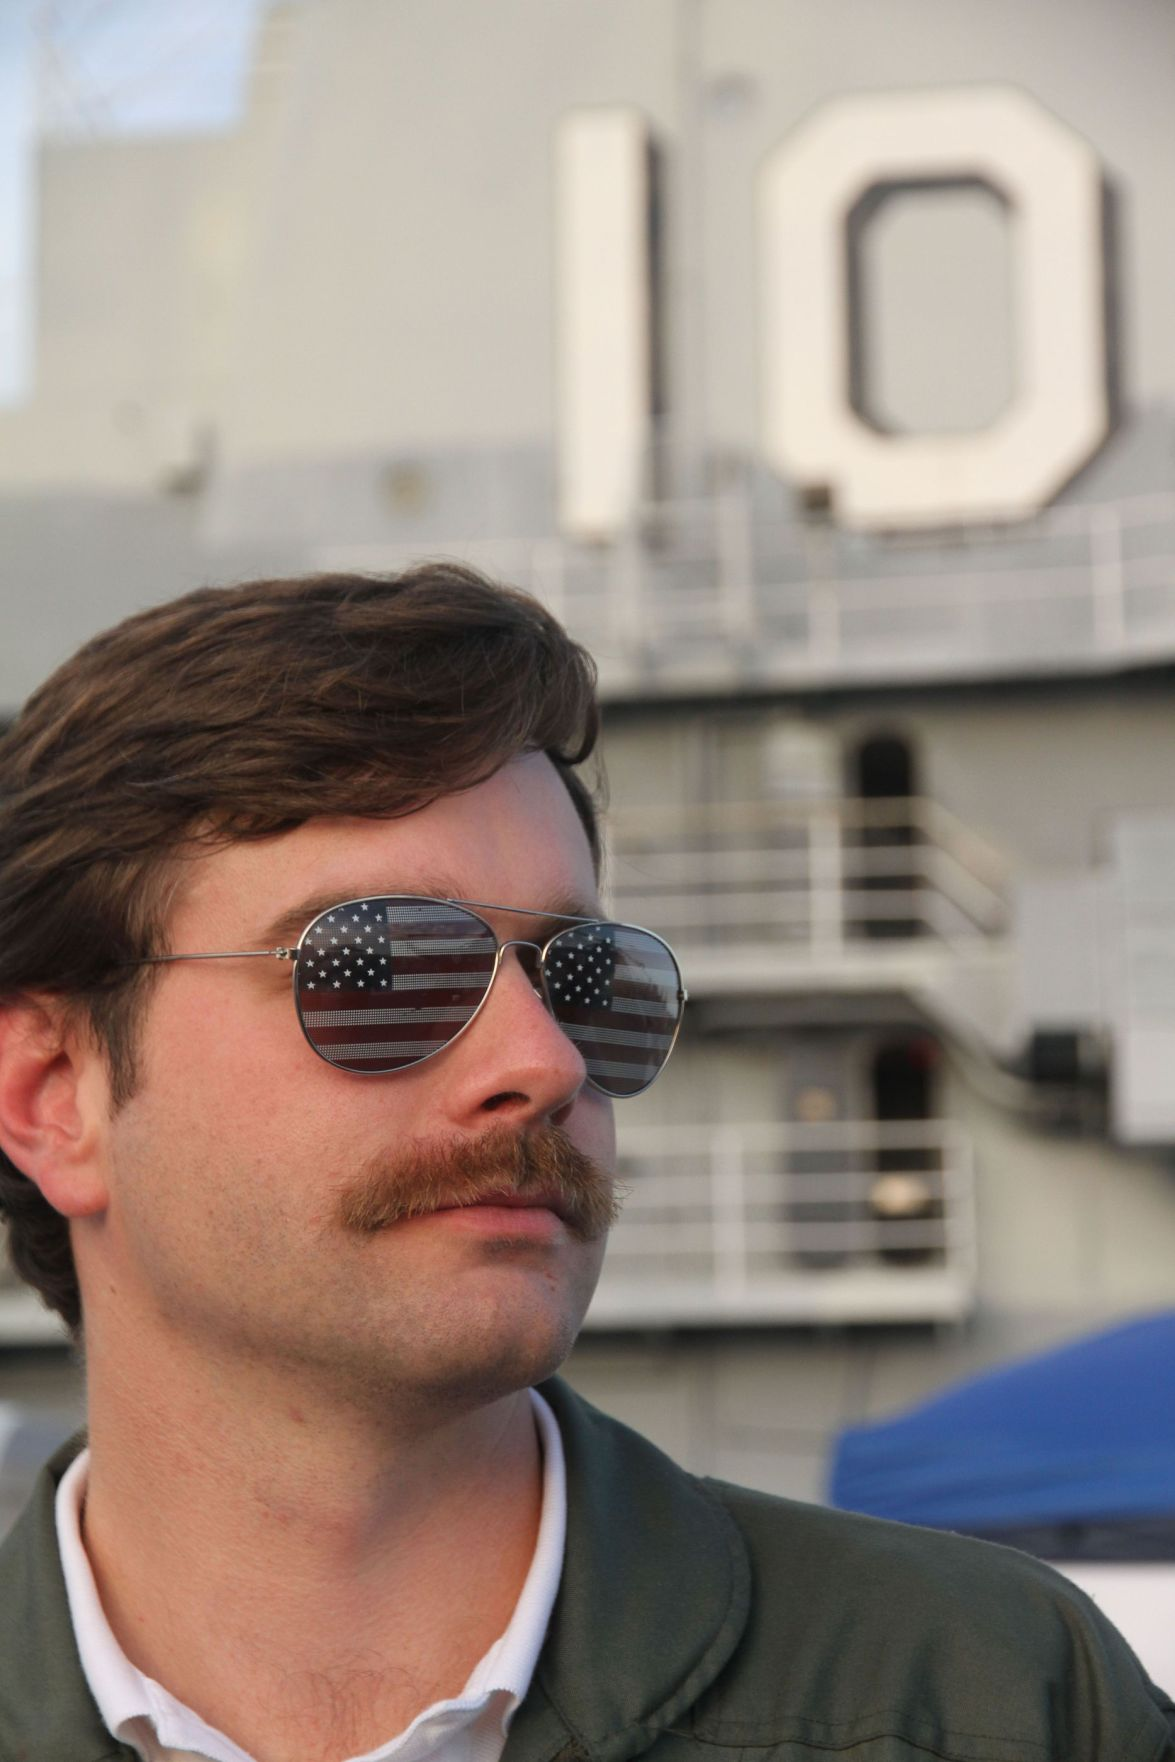 Top Gun Party on the Yorktown postponed to next week due to rain